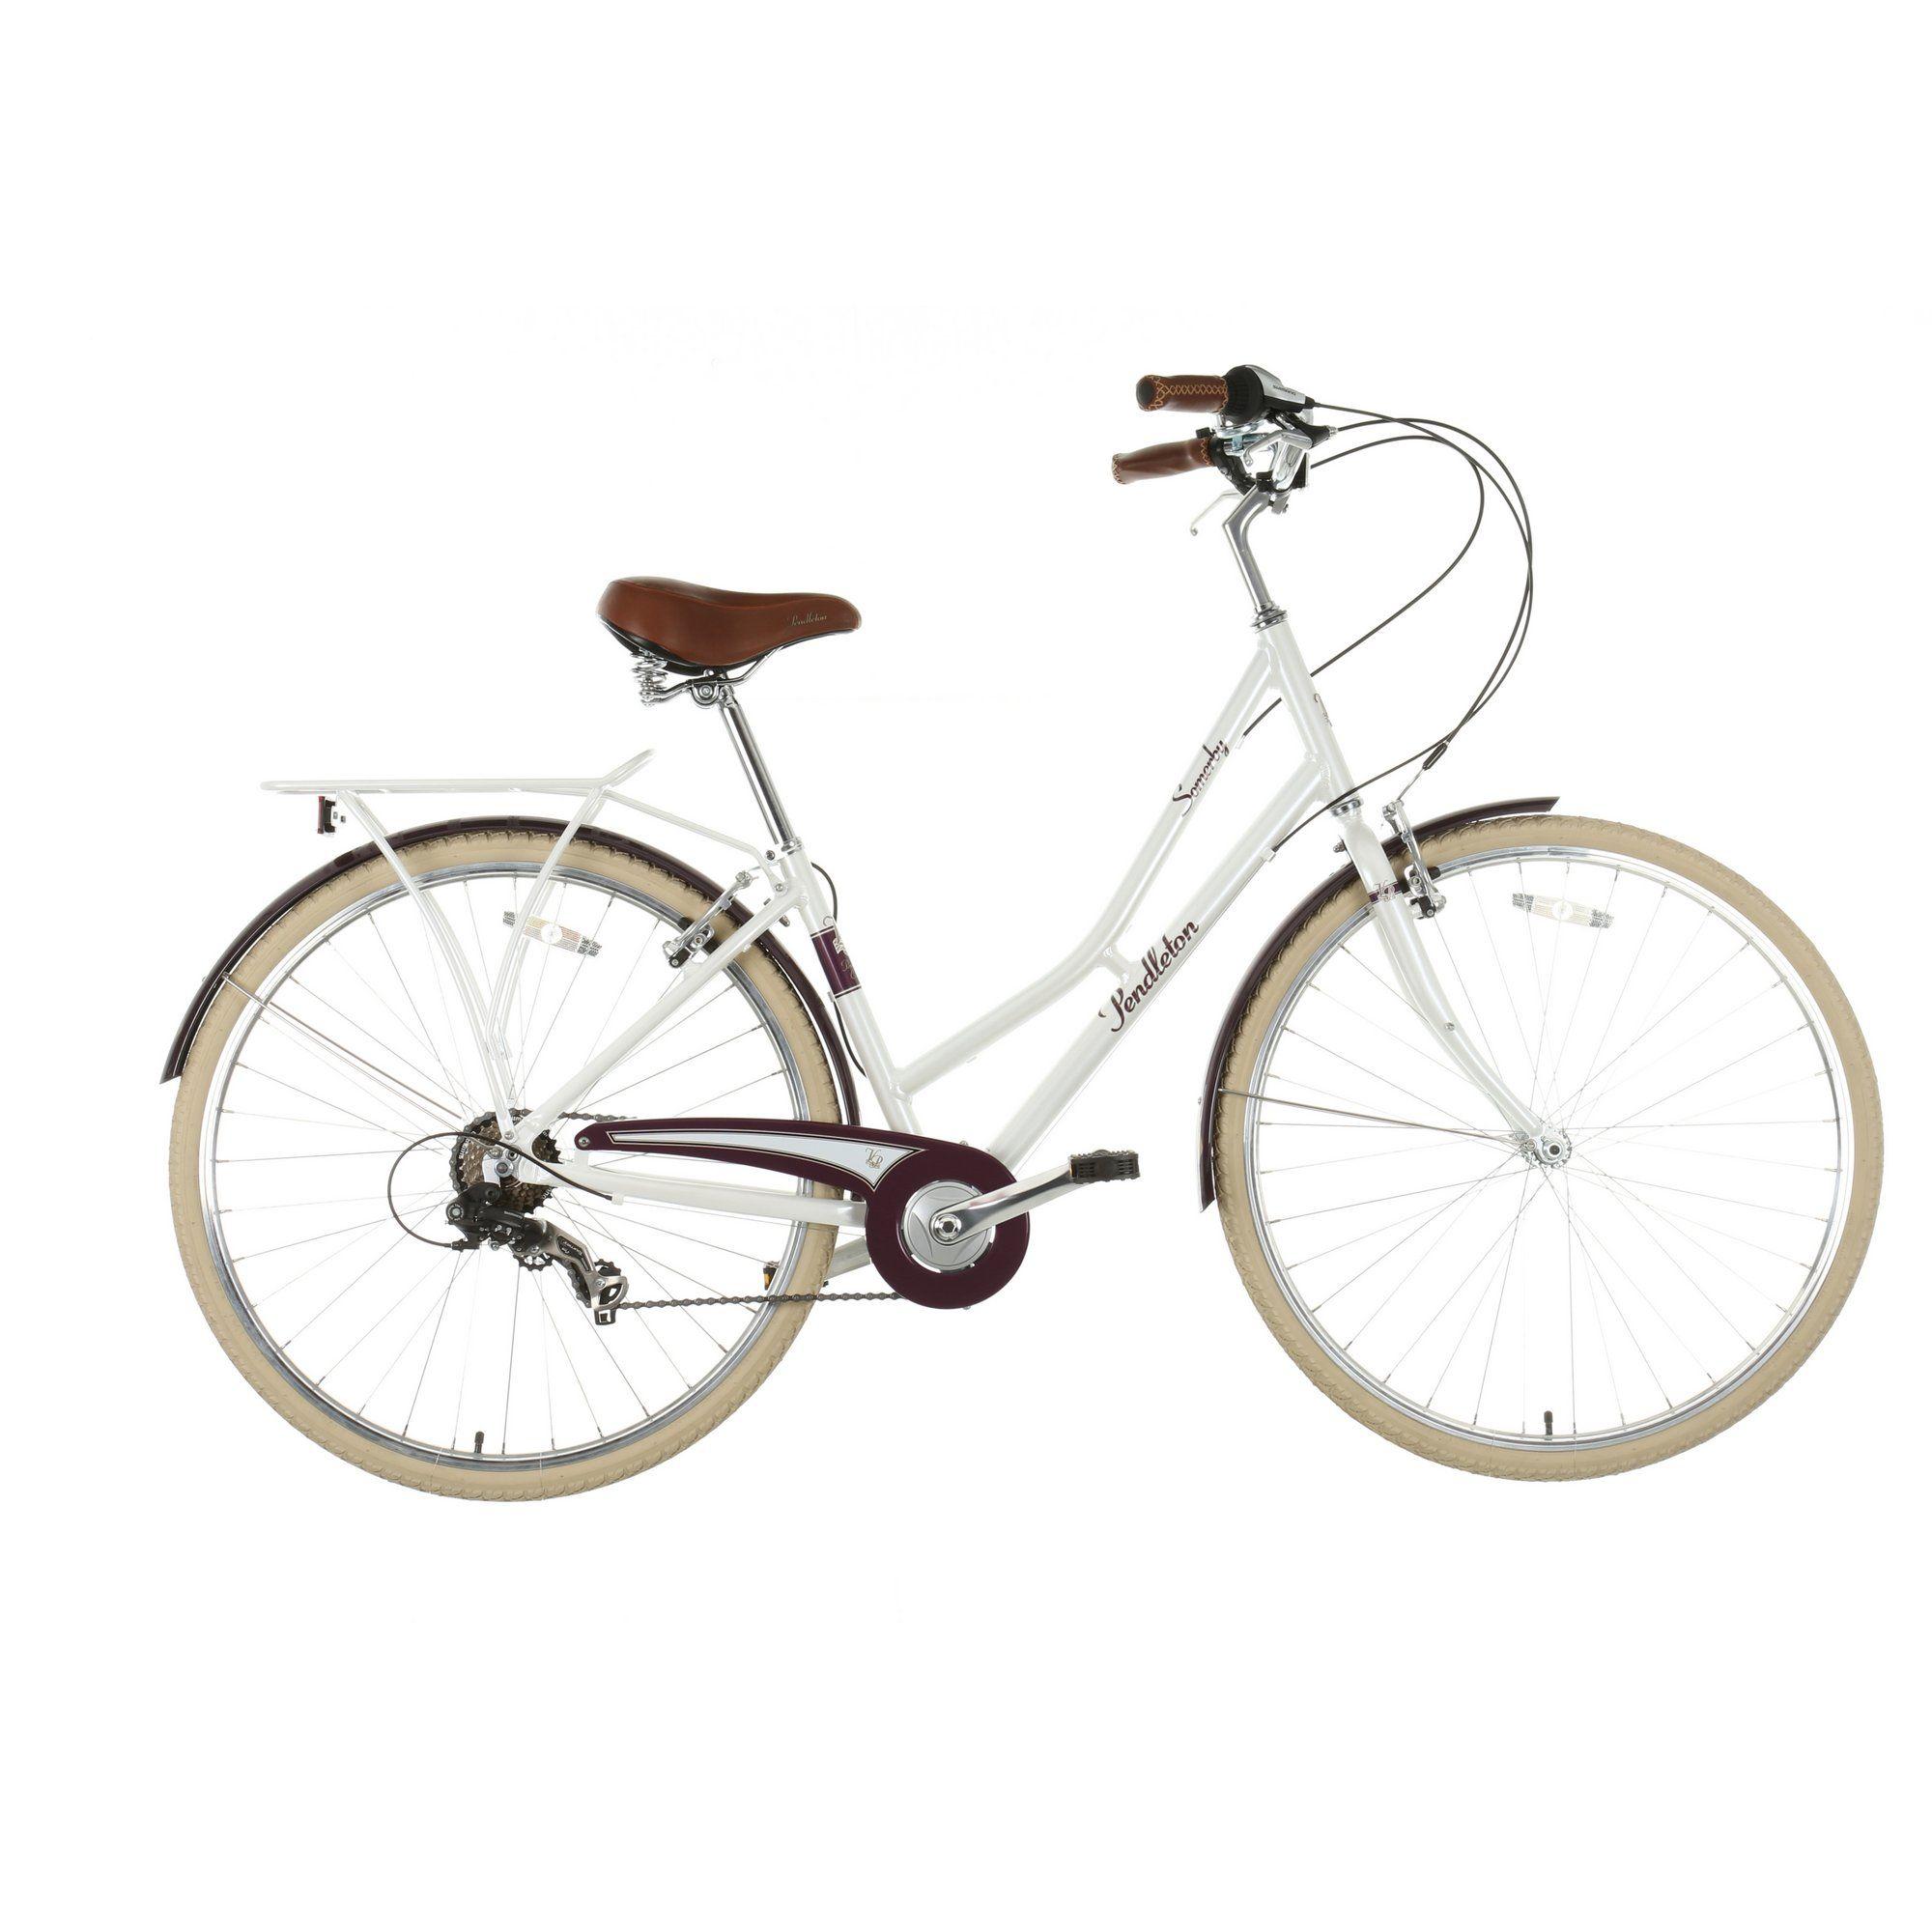 Halfords Pendleton Somerby Limited Edition Hybrid Bike